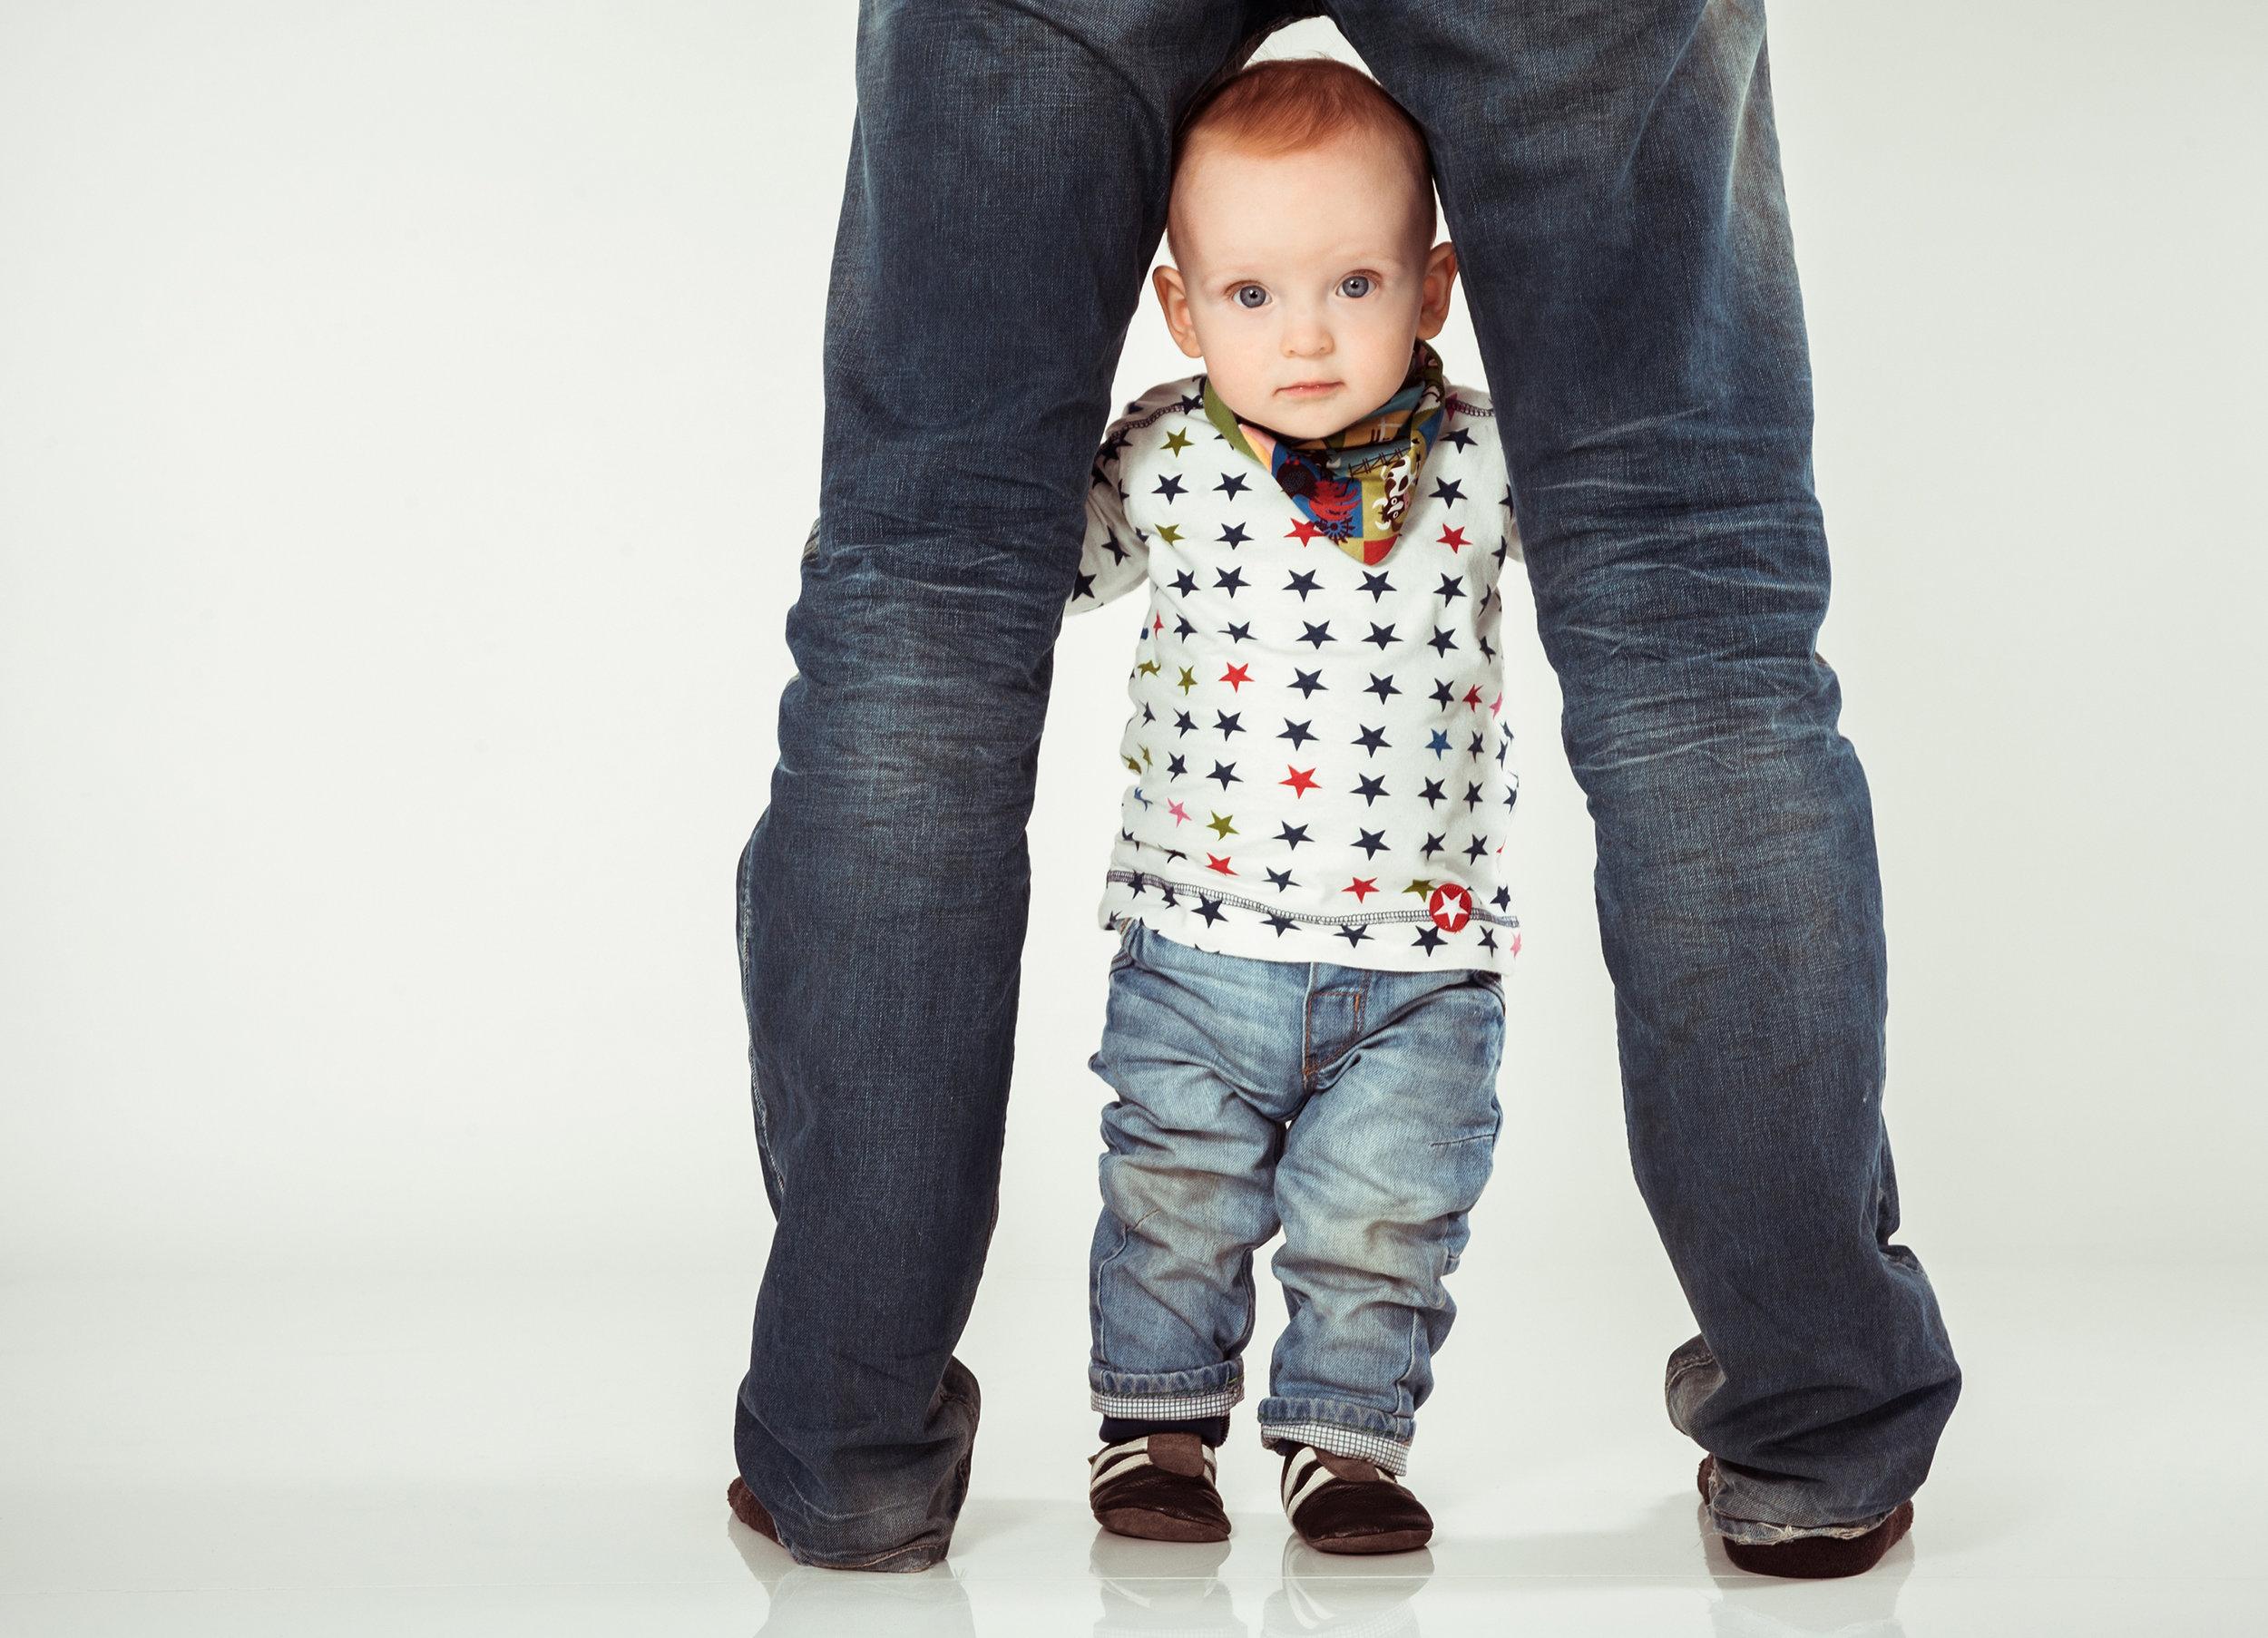 kinderfoto-in-jeans.jpg